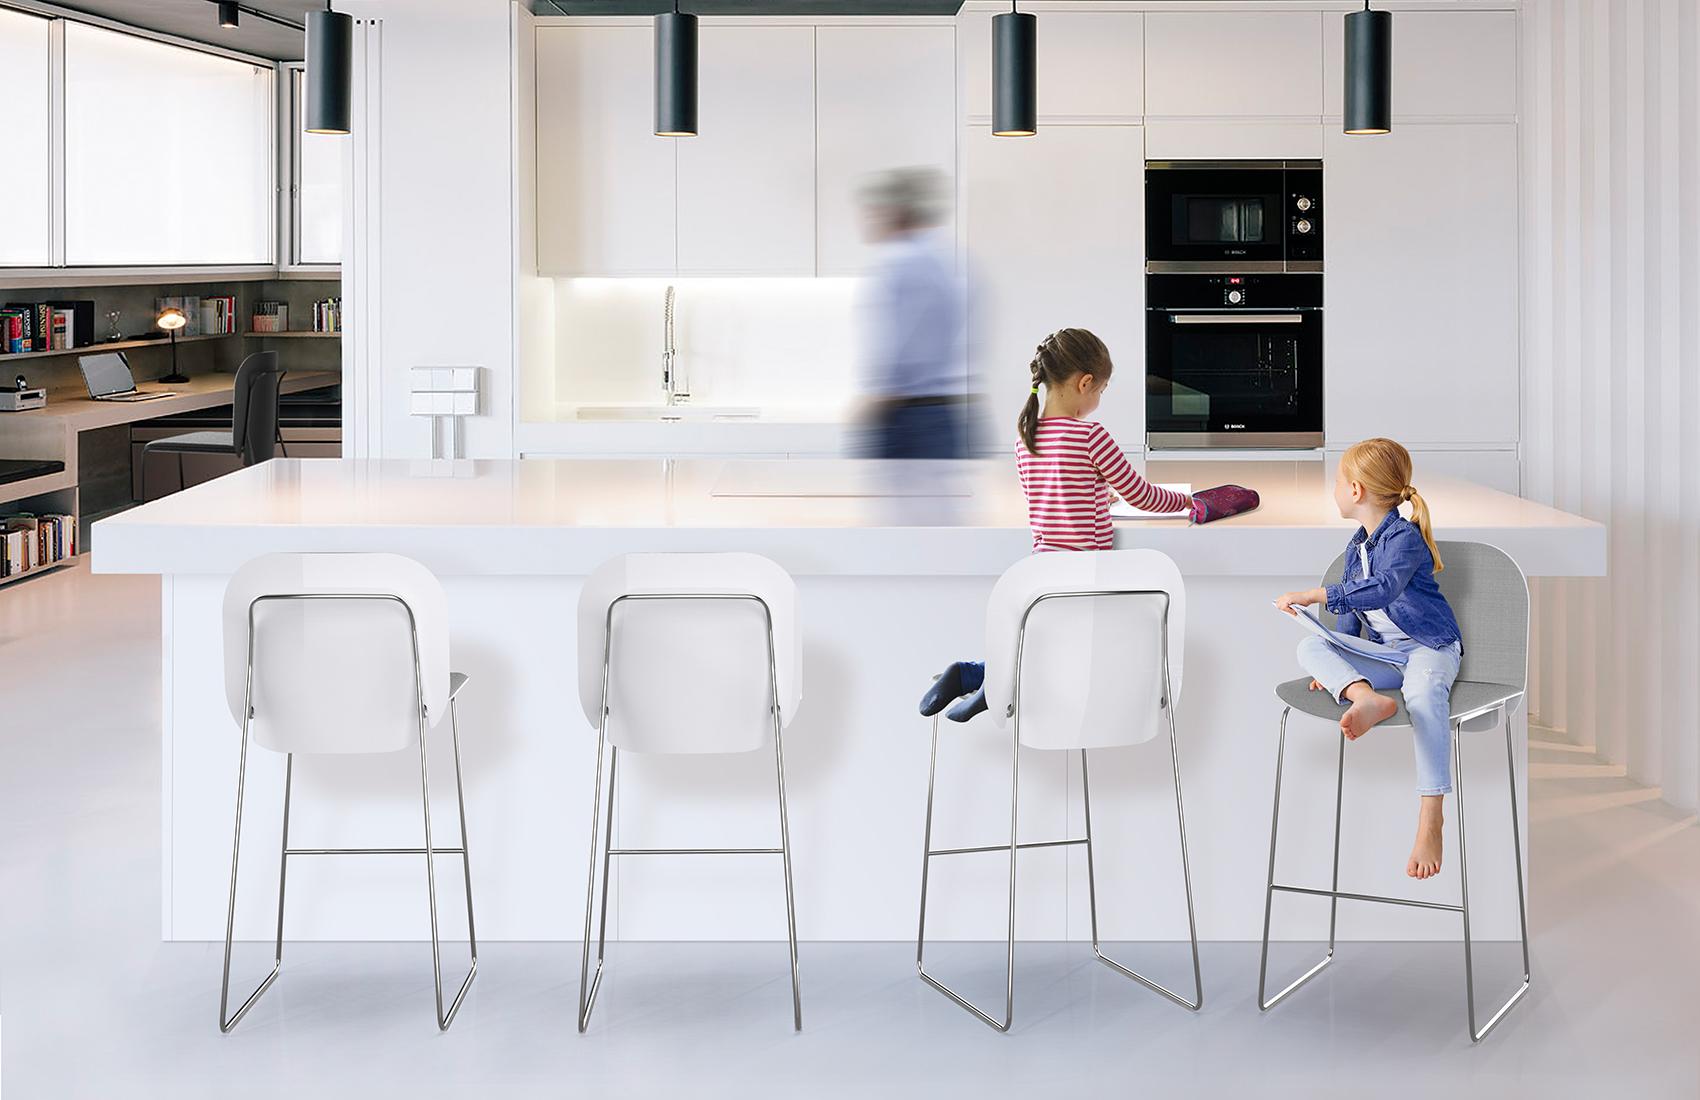 testudo-kitchen.jpg